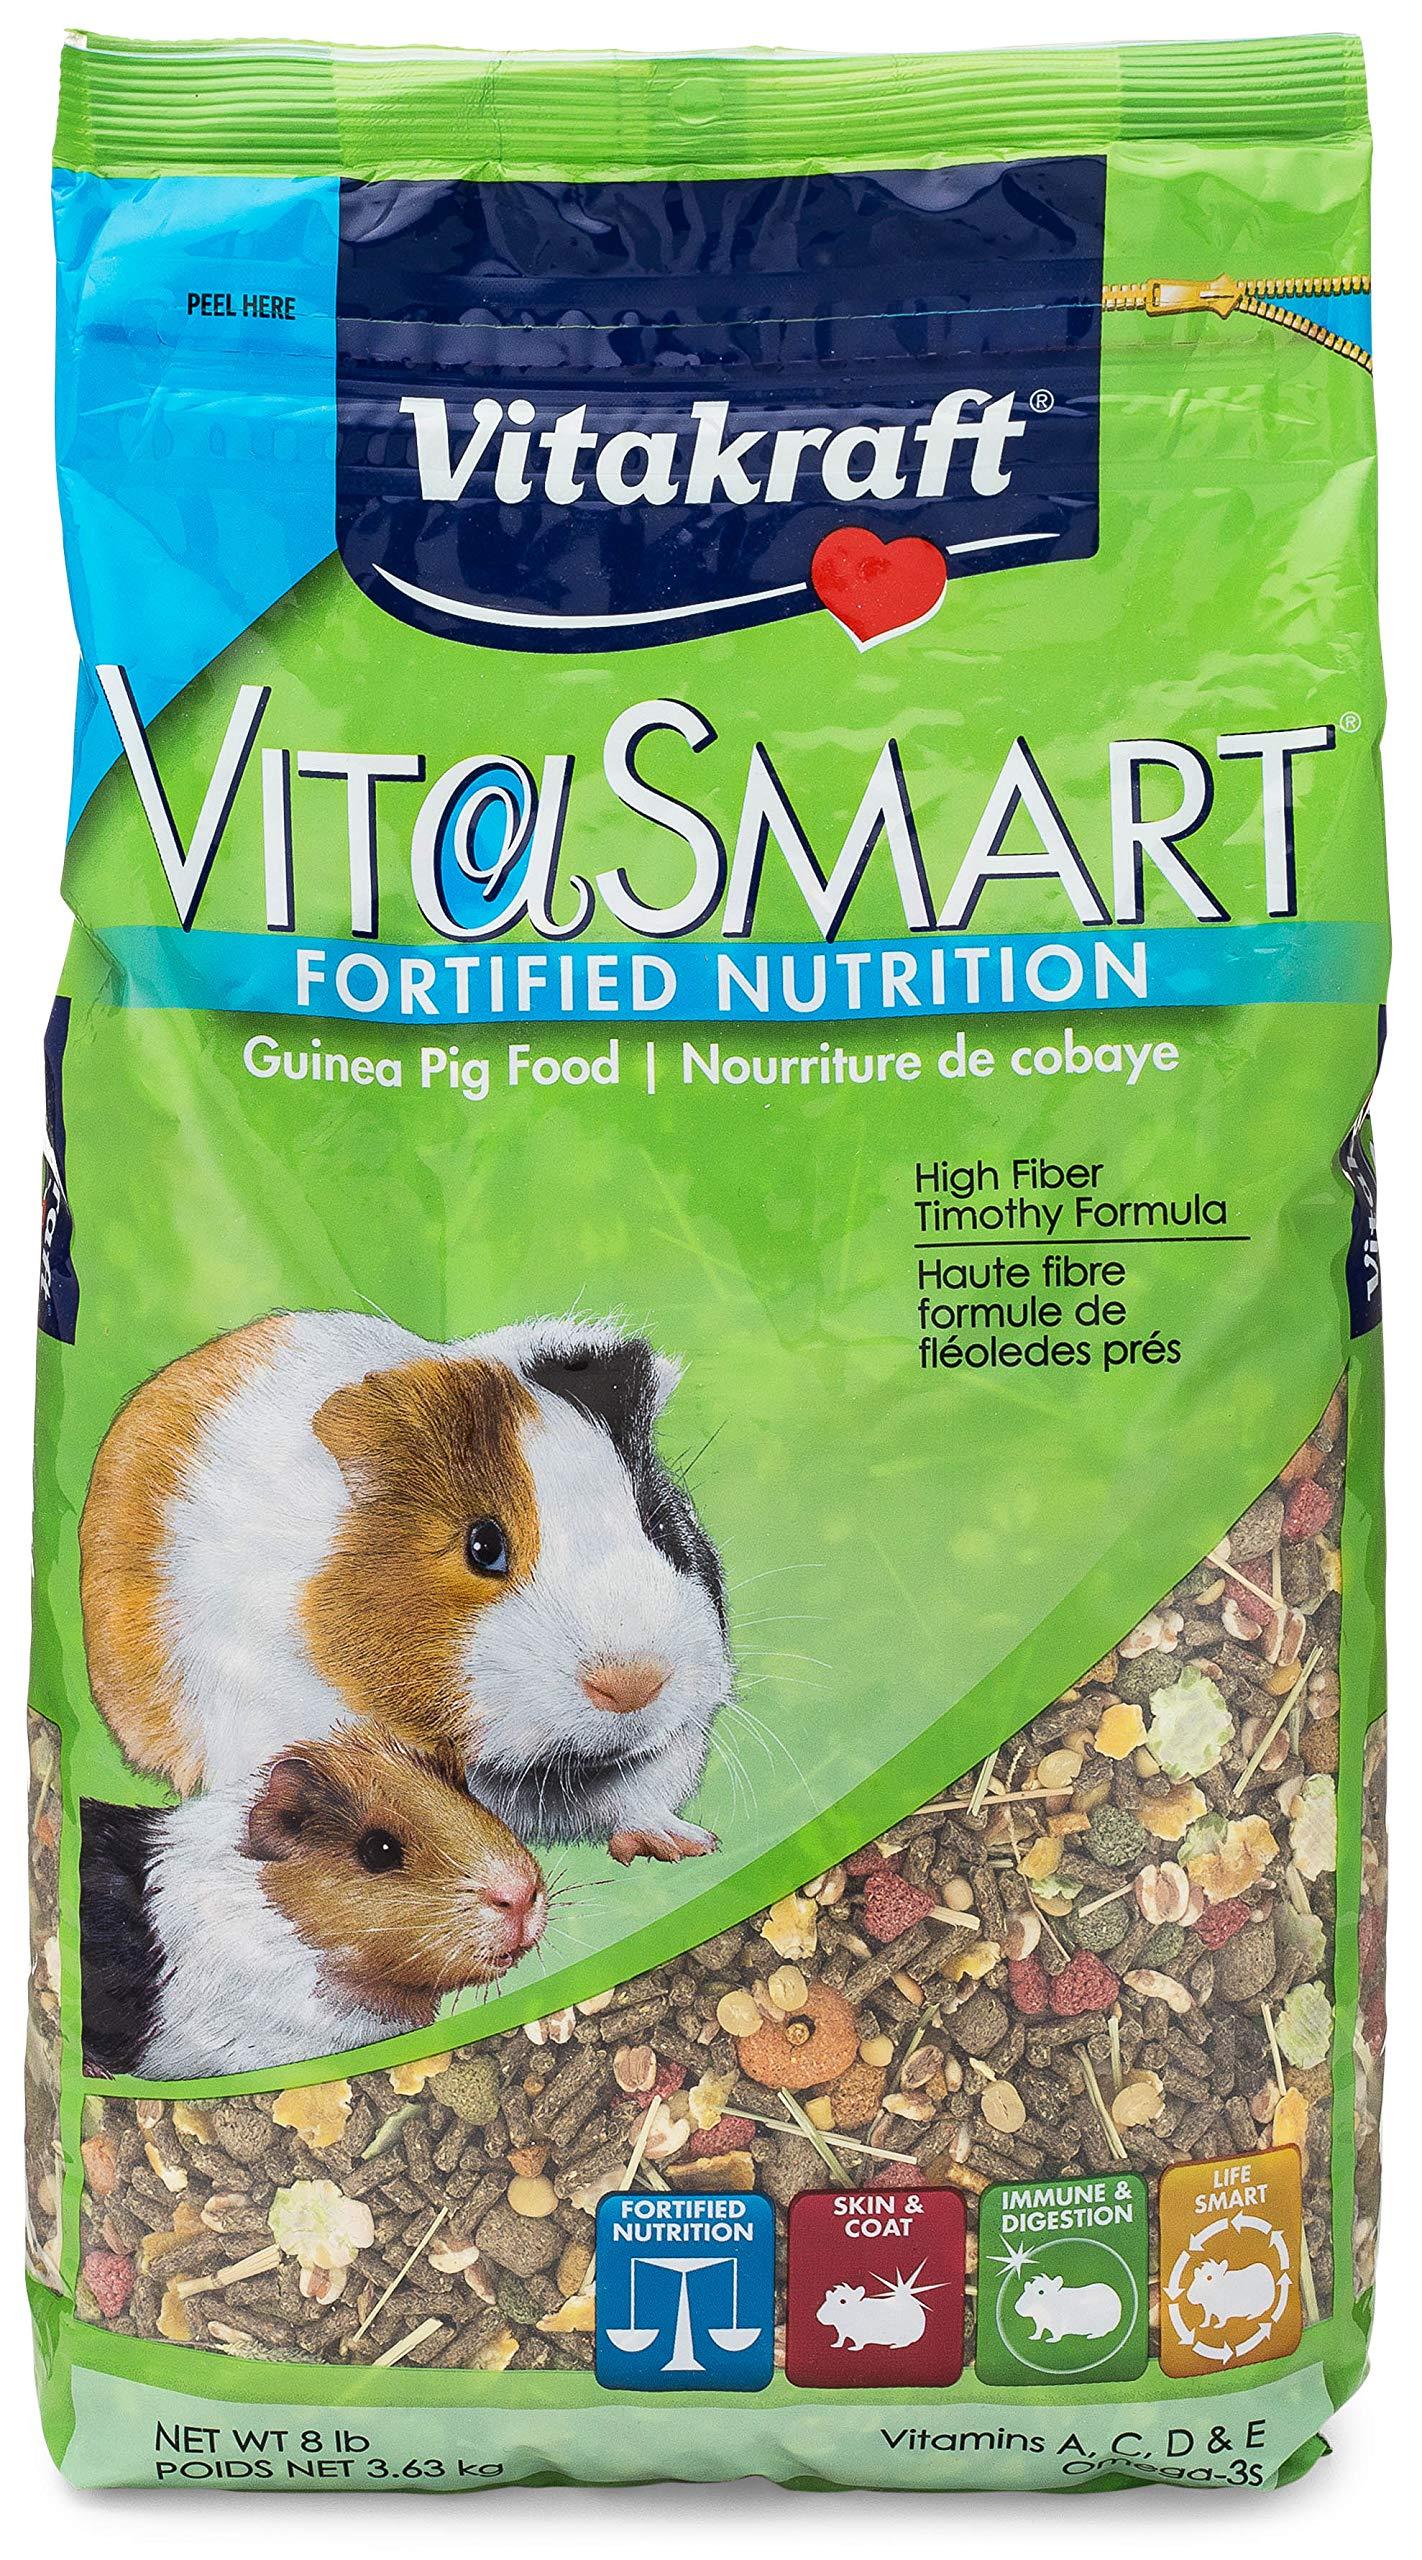 Vitakraft Guinea Pig Food High Fiber Timothy Formula (1 Pouch), 8 Lb by Vitakraft